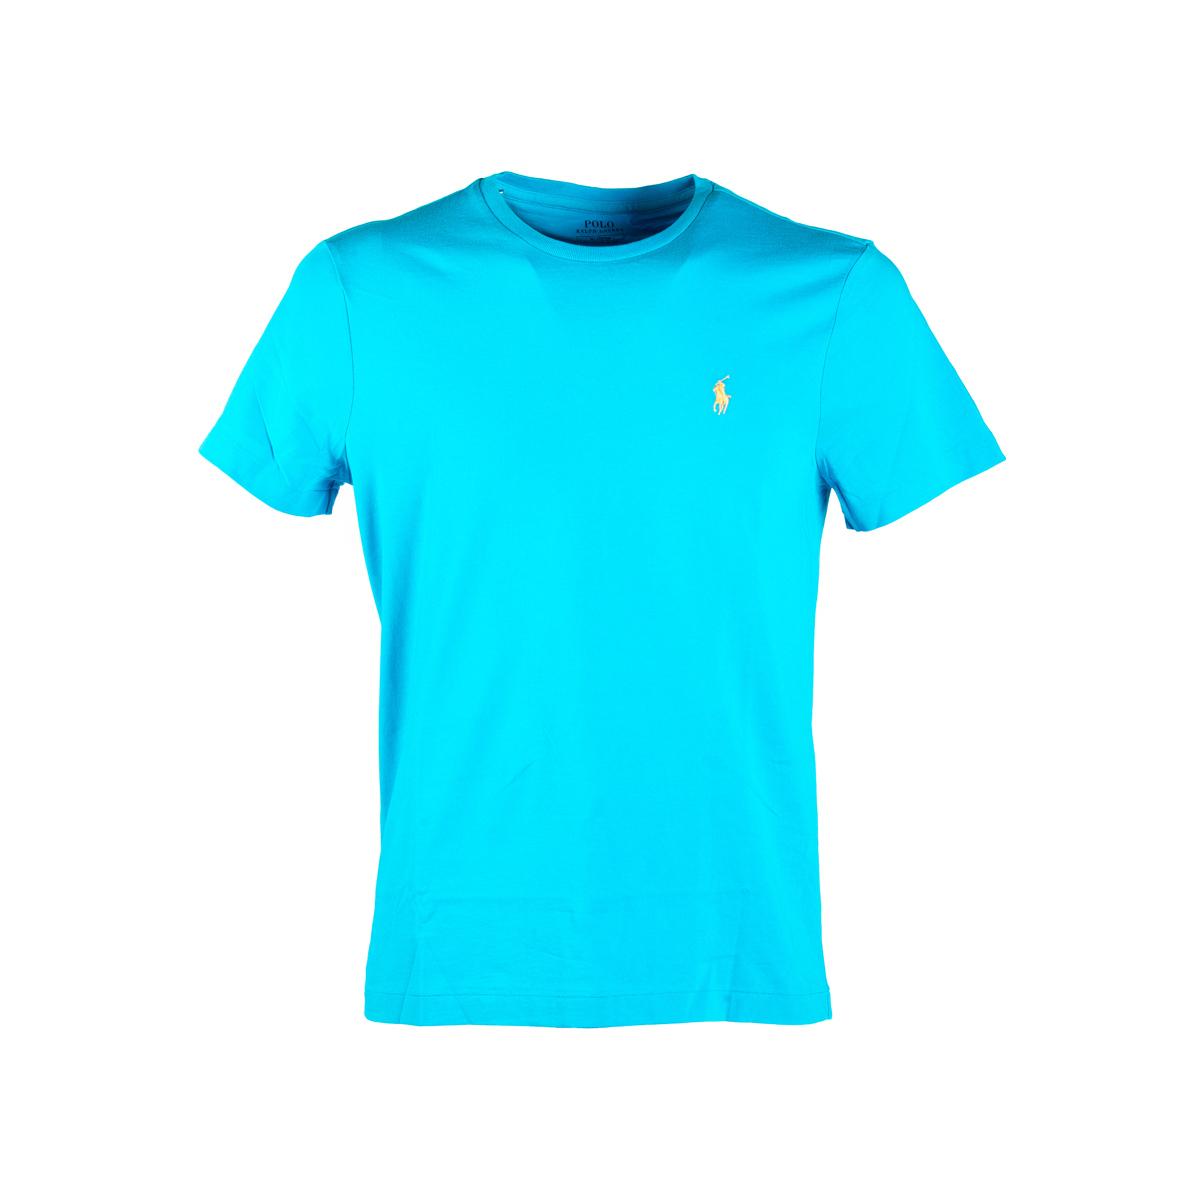 T-Shirt Polo Ralph Lauren Turchese